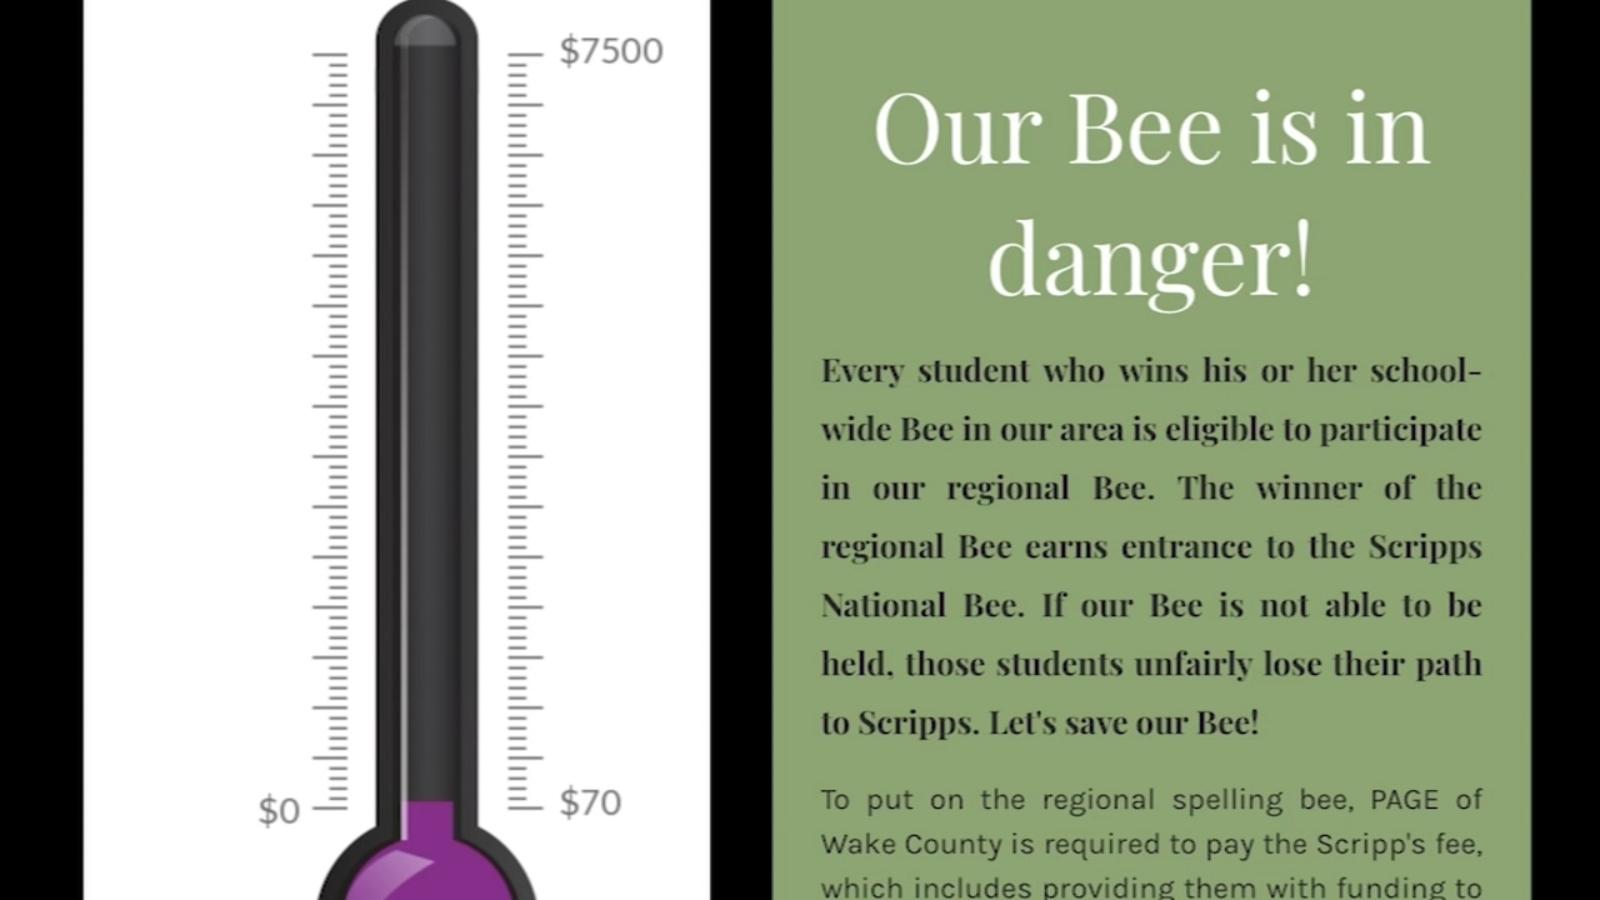 Wake County Spelling Bee in jeopardy after losing sponsor